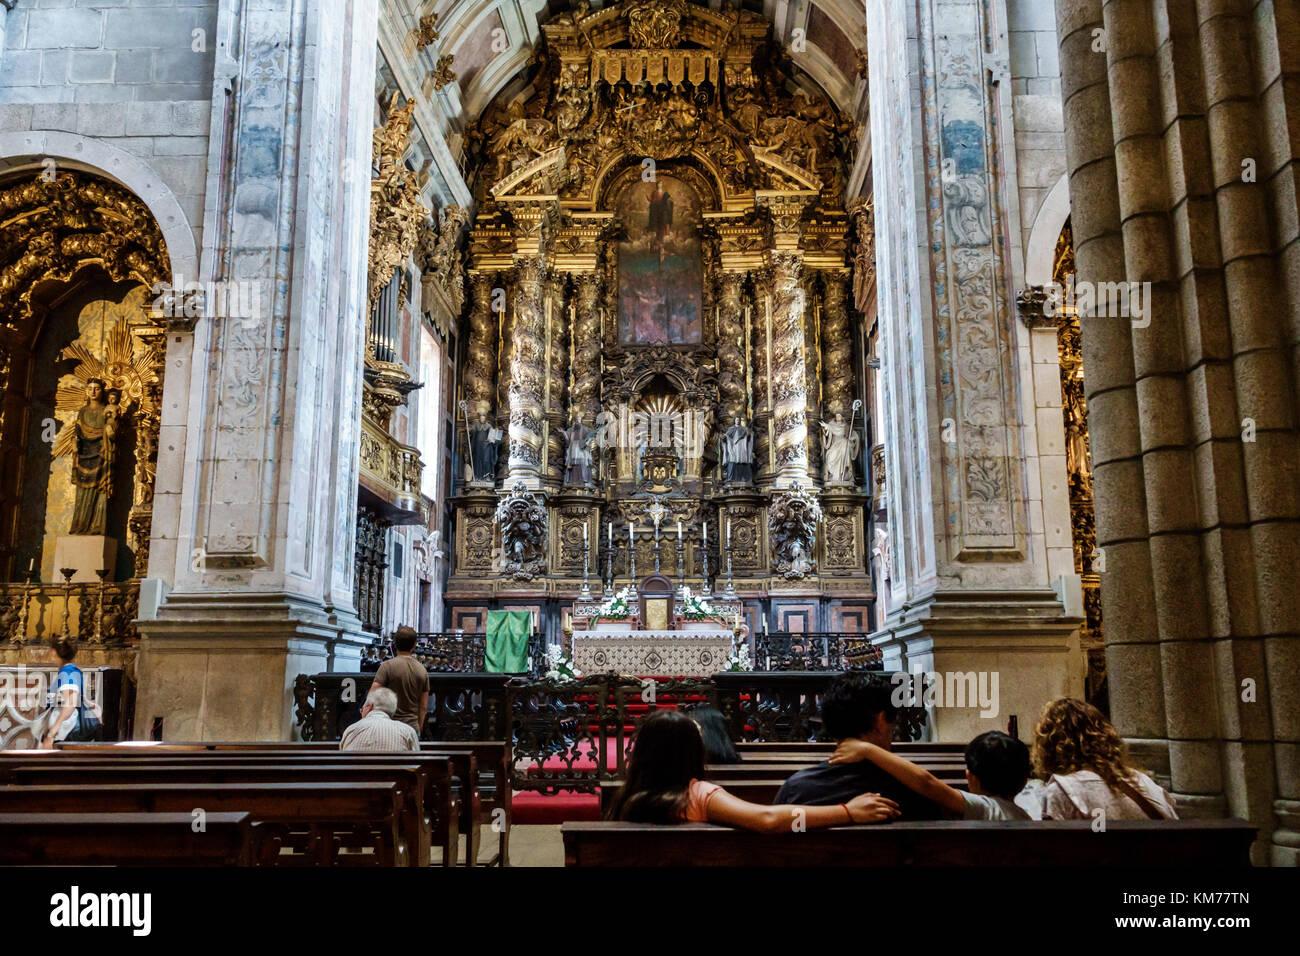 Porto Portugal historic center Se do Porto Porto Cathedral Roman Catholic church interior main altar pews family - Stock Image